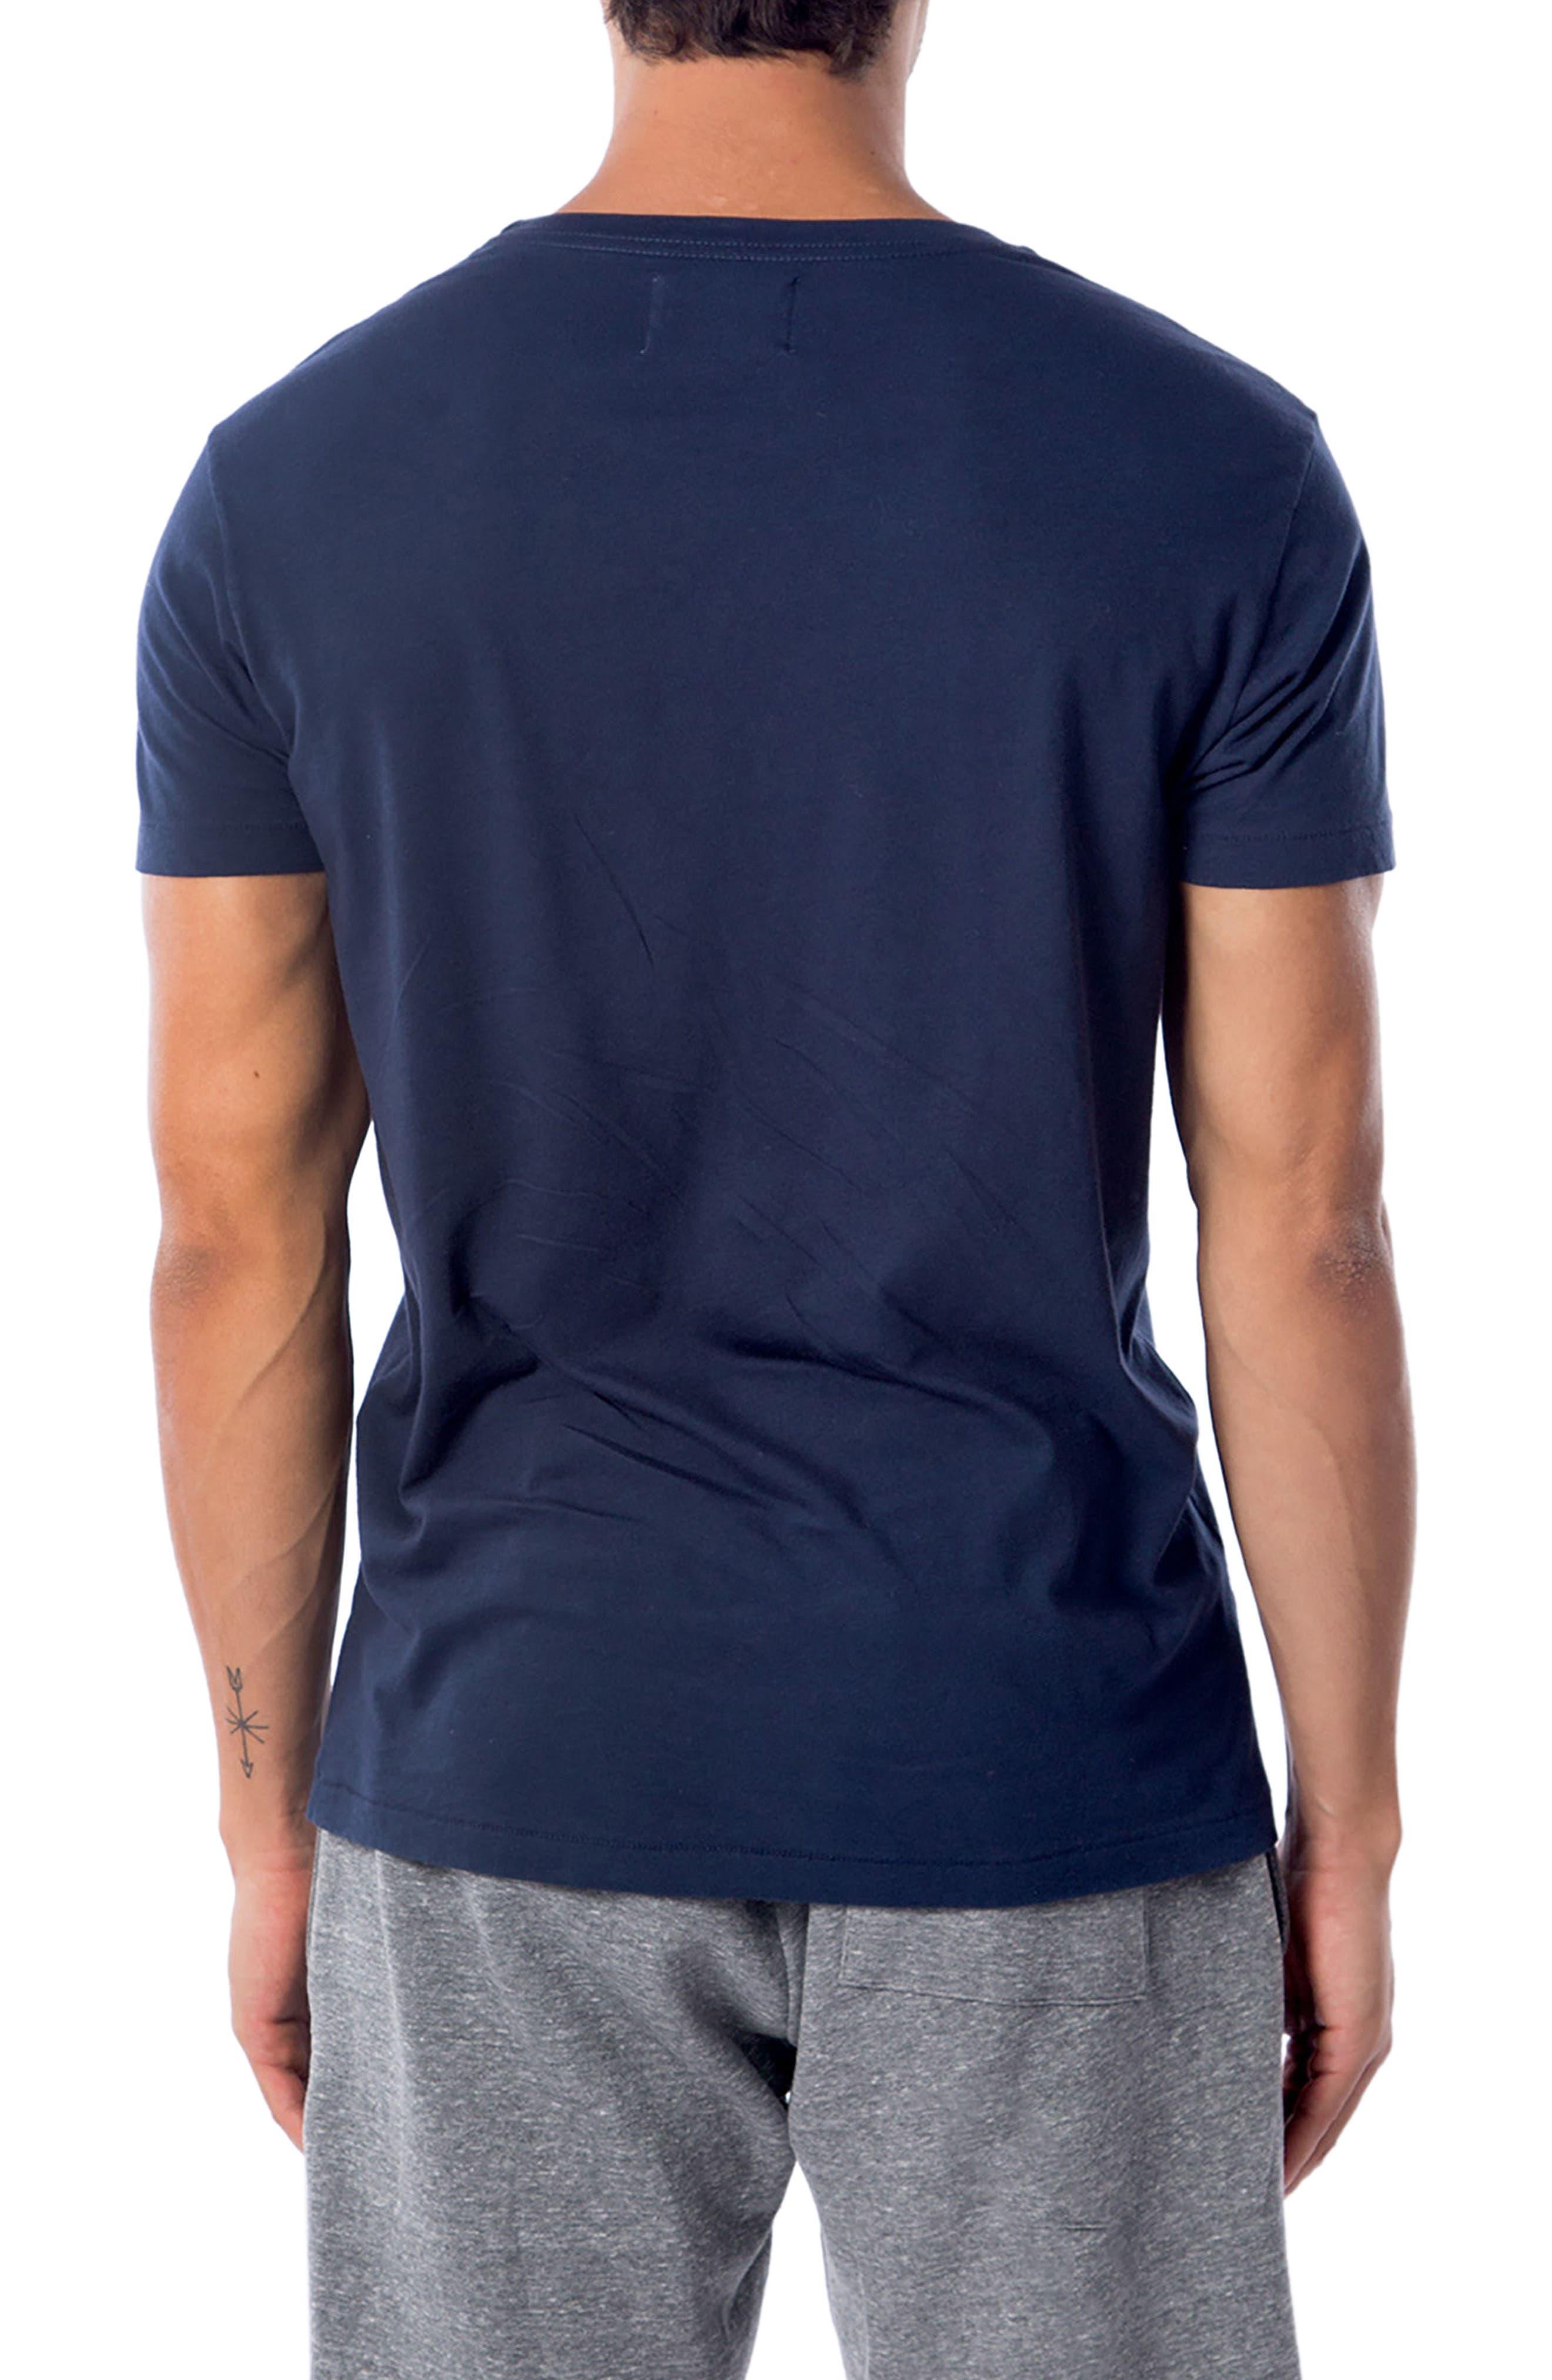 American Waves T-Shirt,                             Alternate thumbnail 2, color,                             401